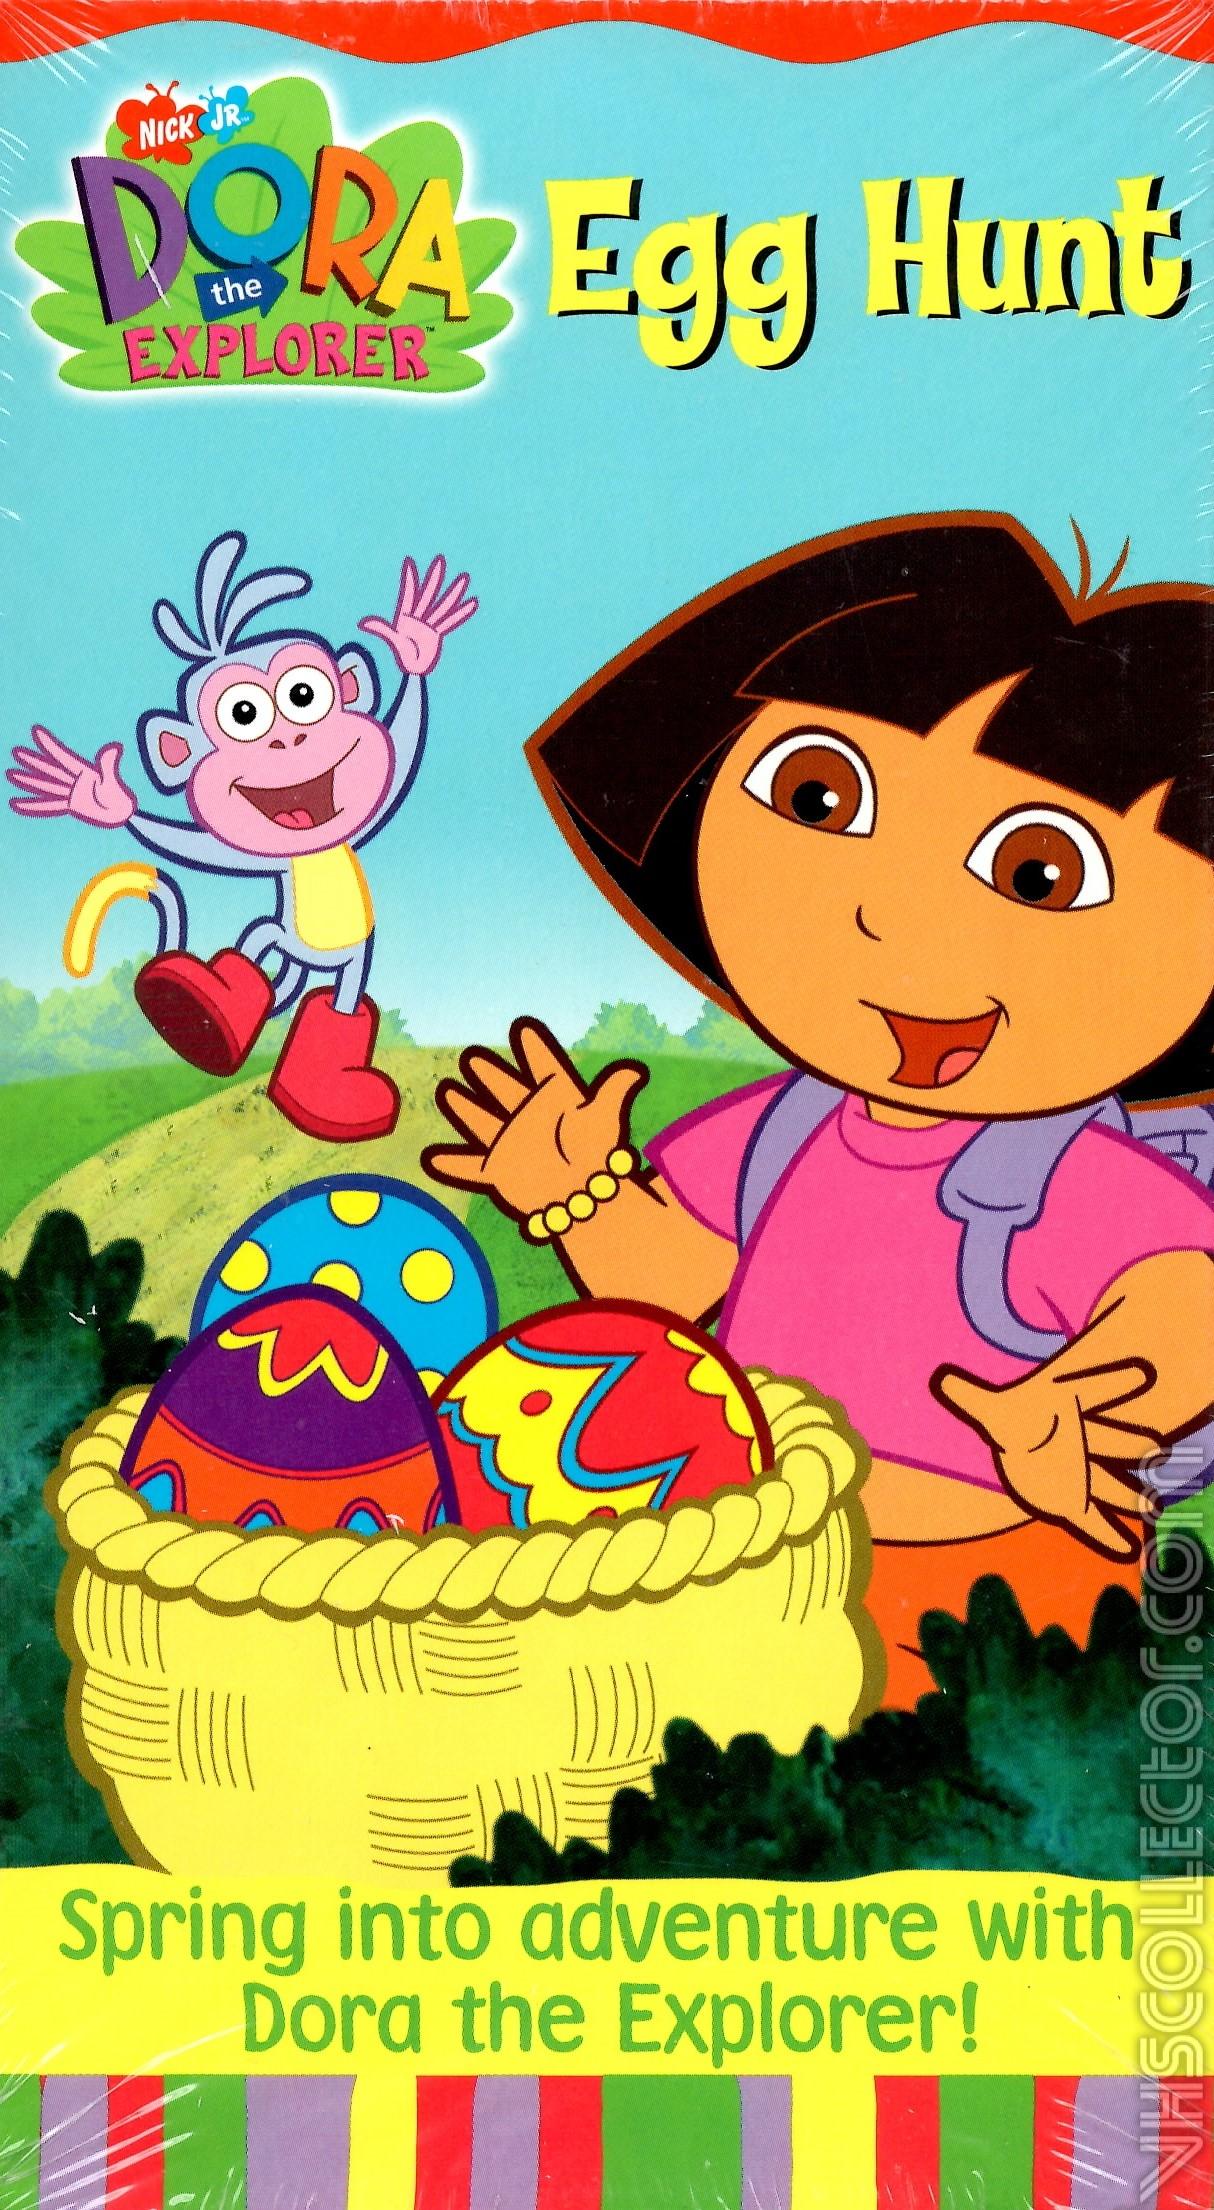 Dora The Explorer Egg Hunt  VHSCollectorcom